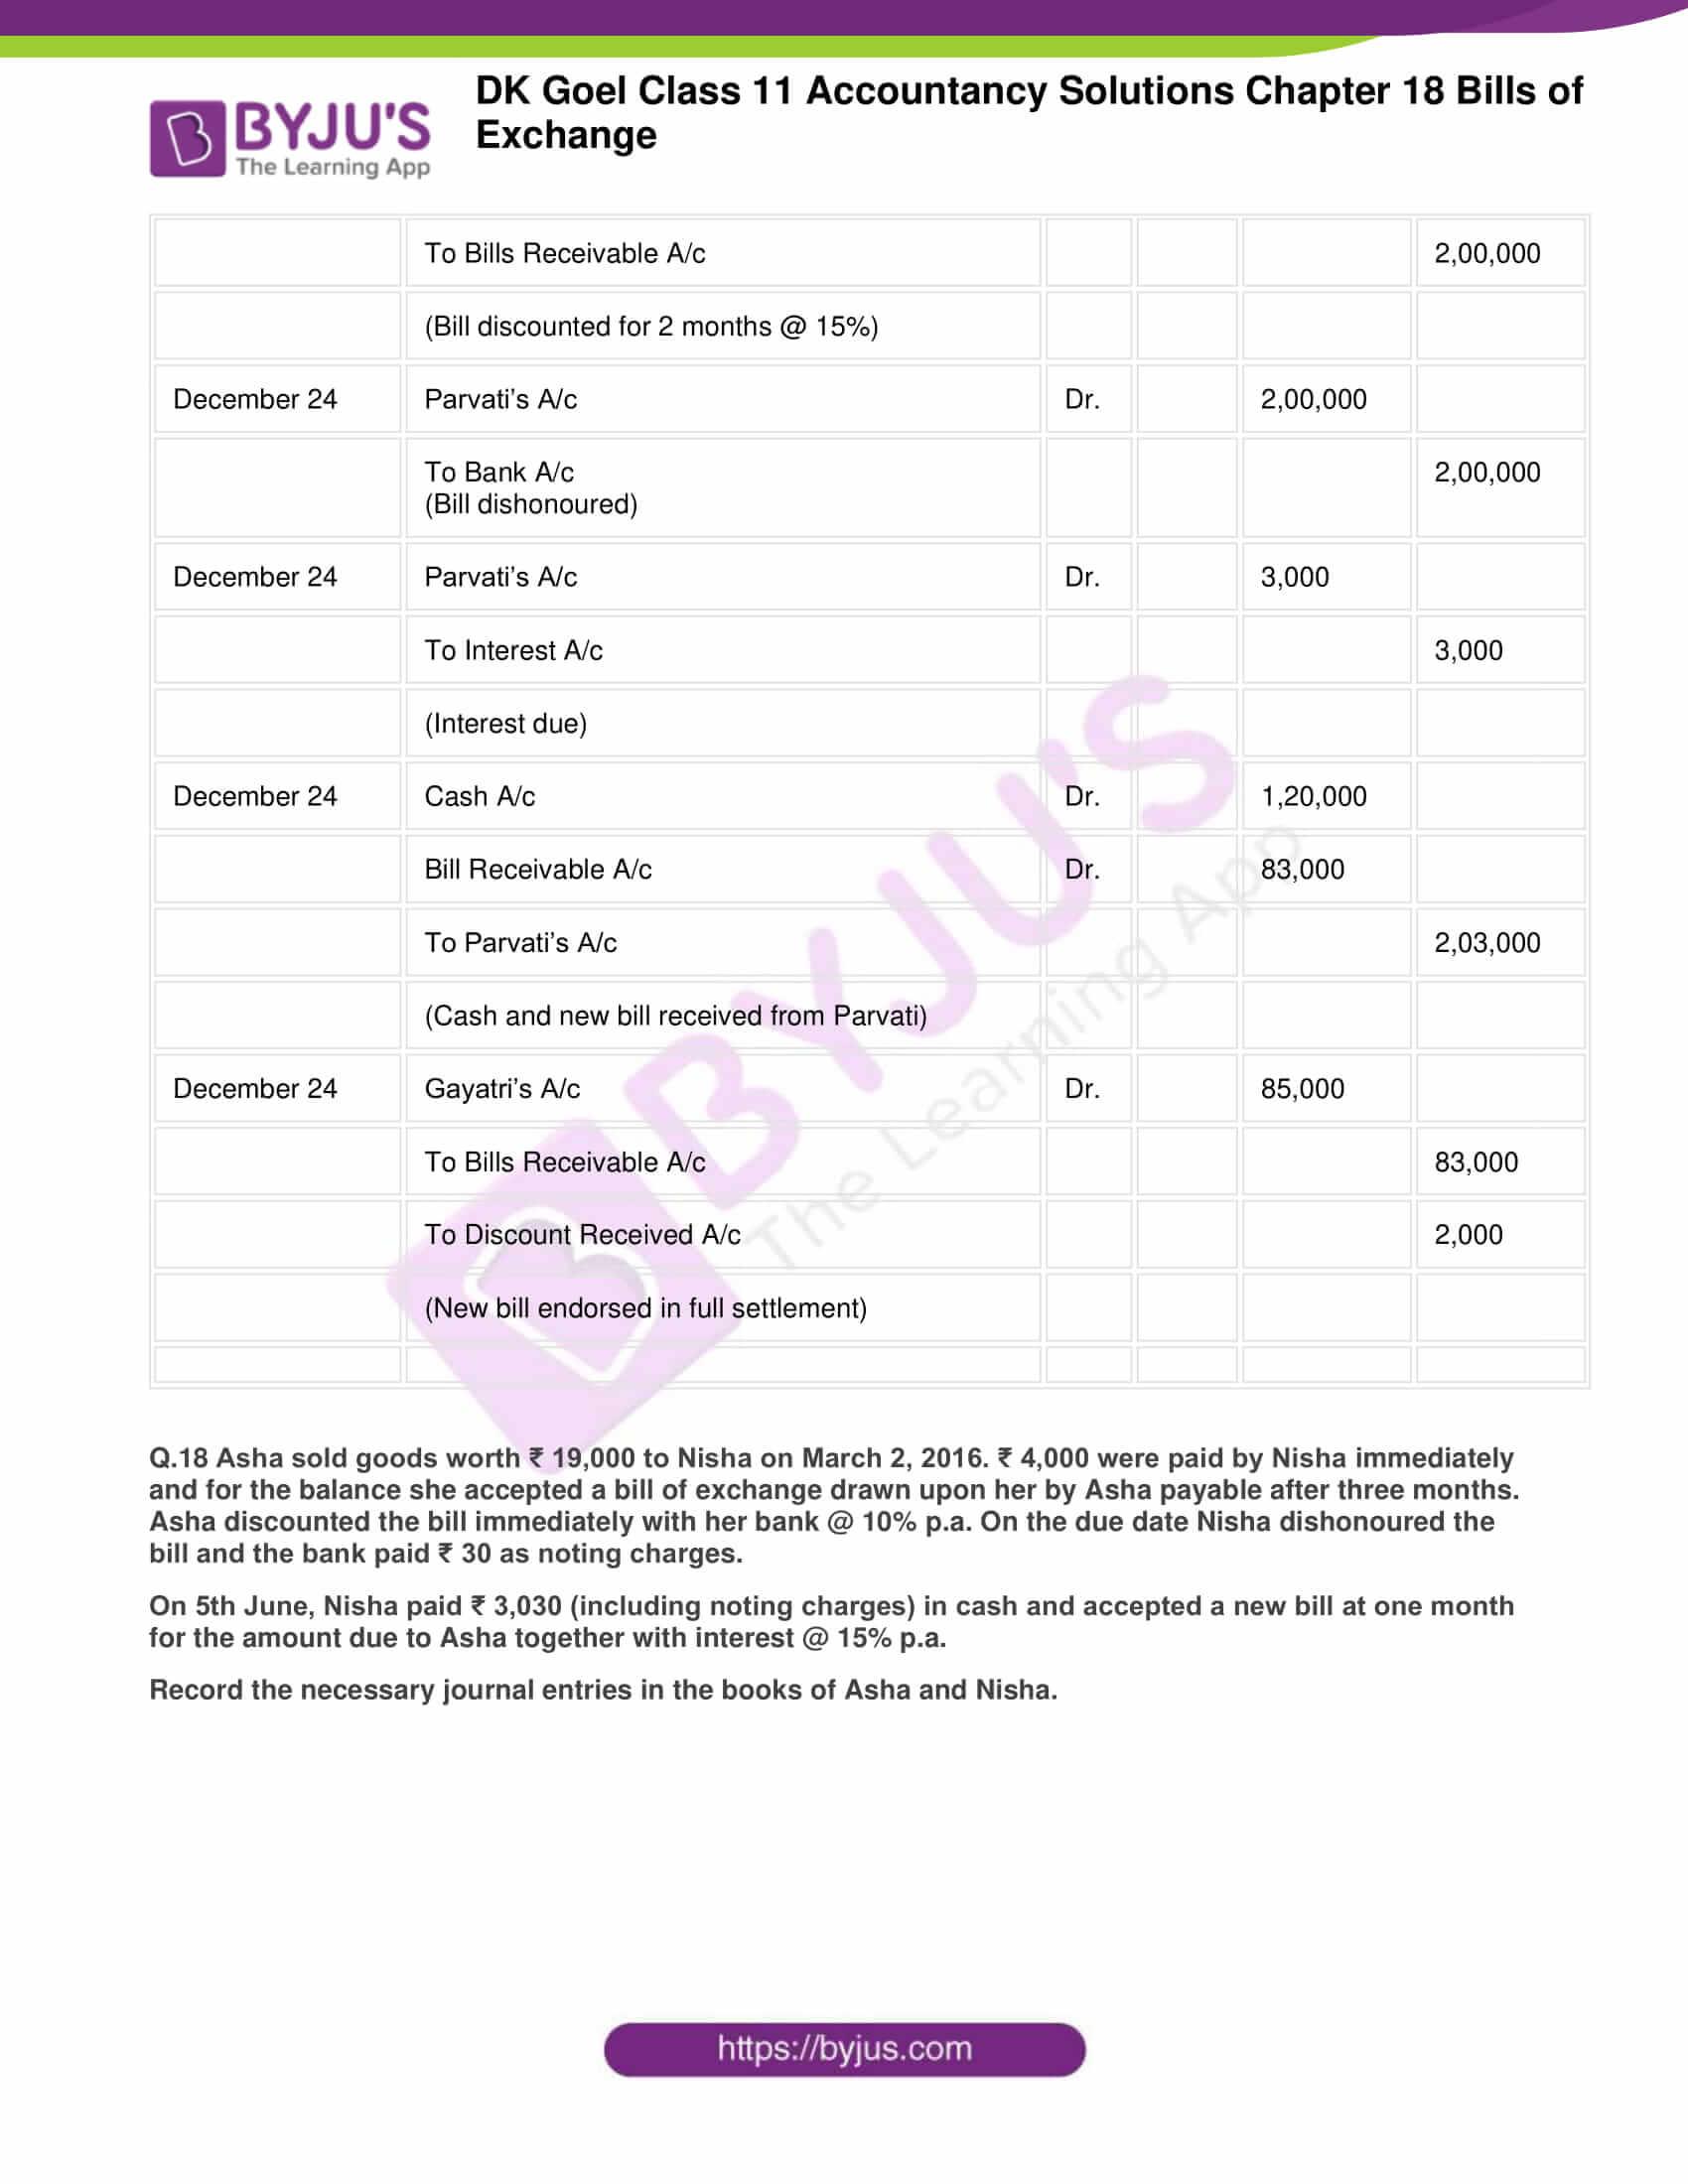 dk goel class 11 accountancy solutions chapter 18 040